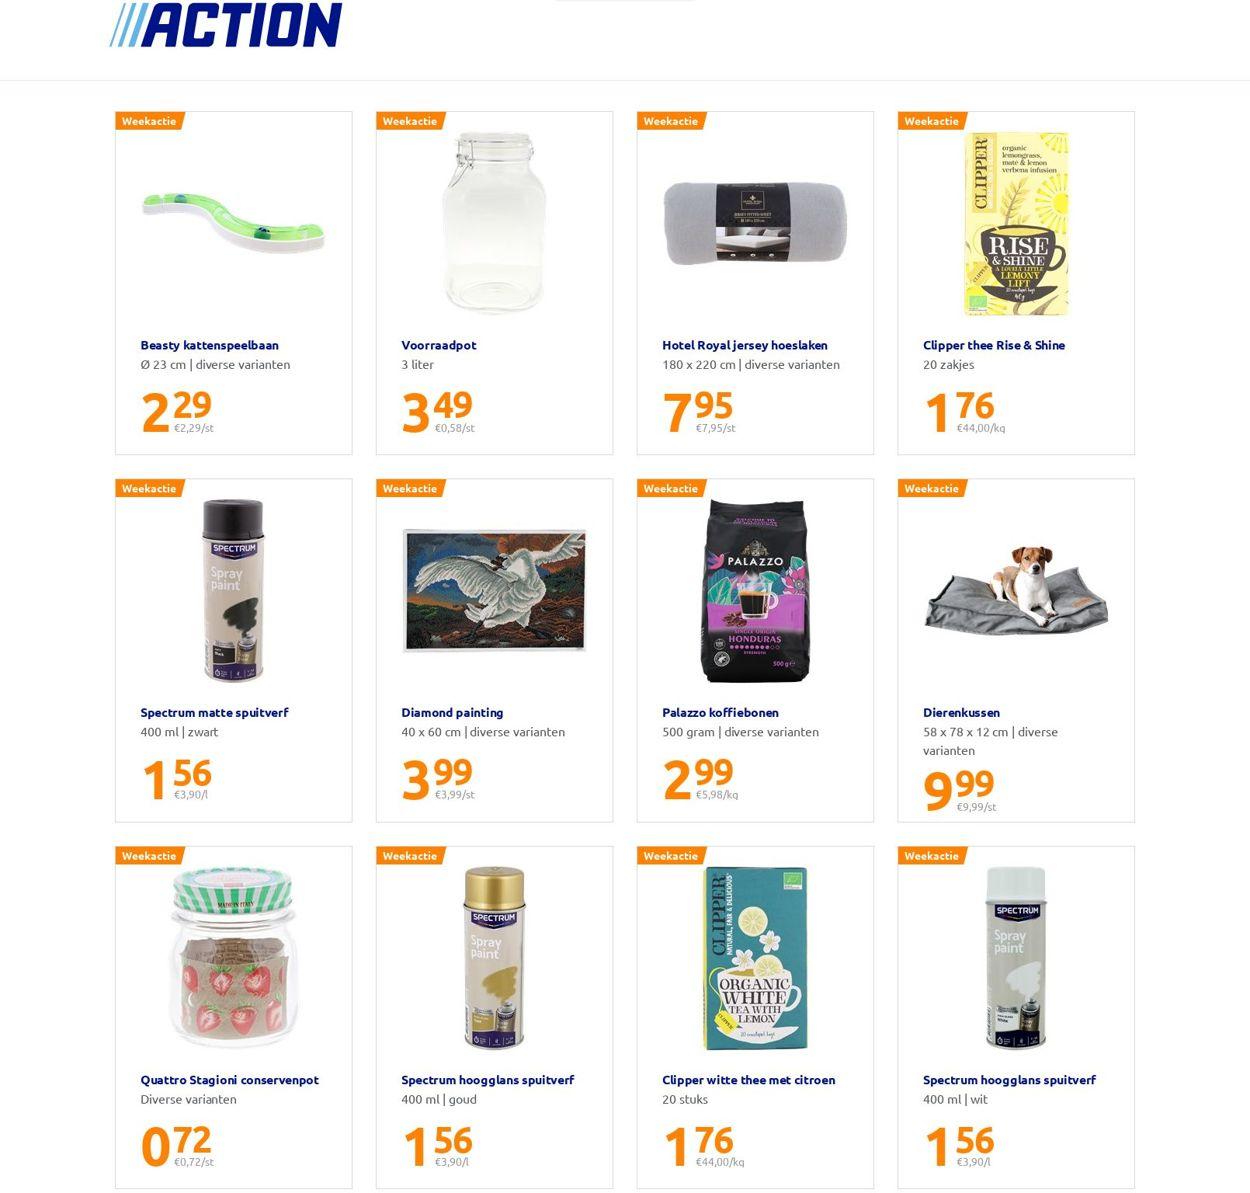 Action Folder - 22.09-28.09.2021